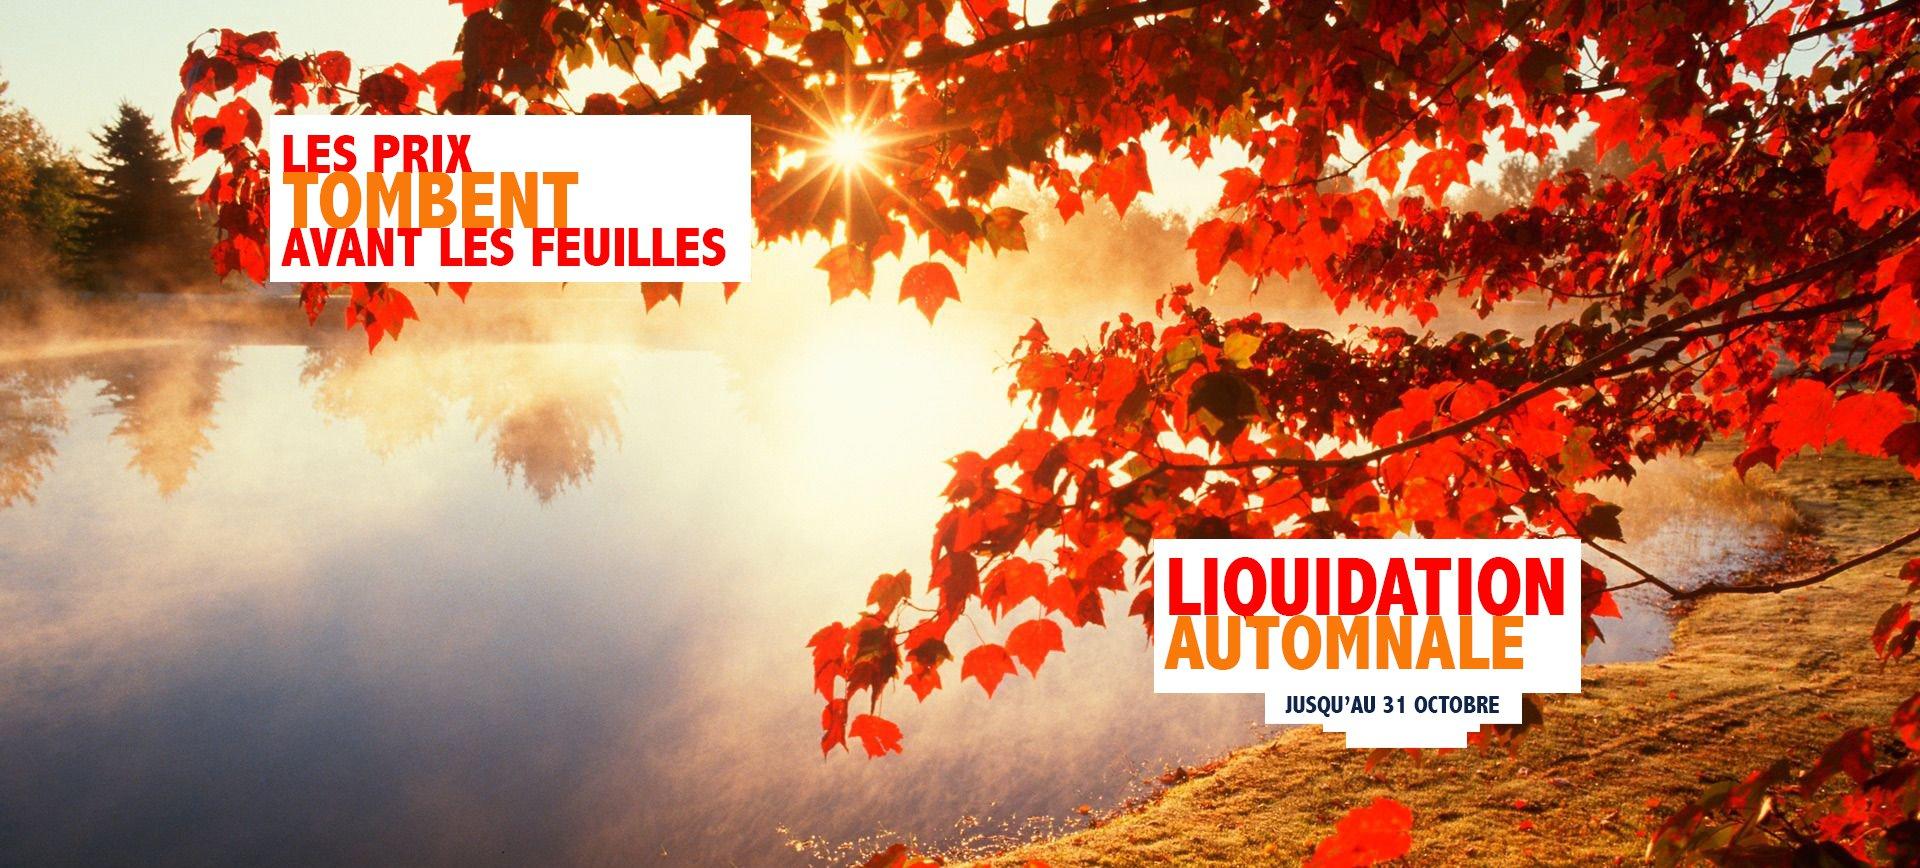 Larson LSR 2100 - Liquidationautomne2015